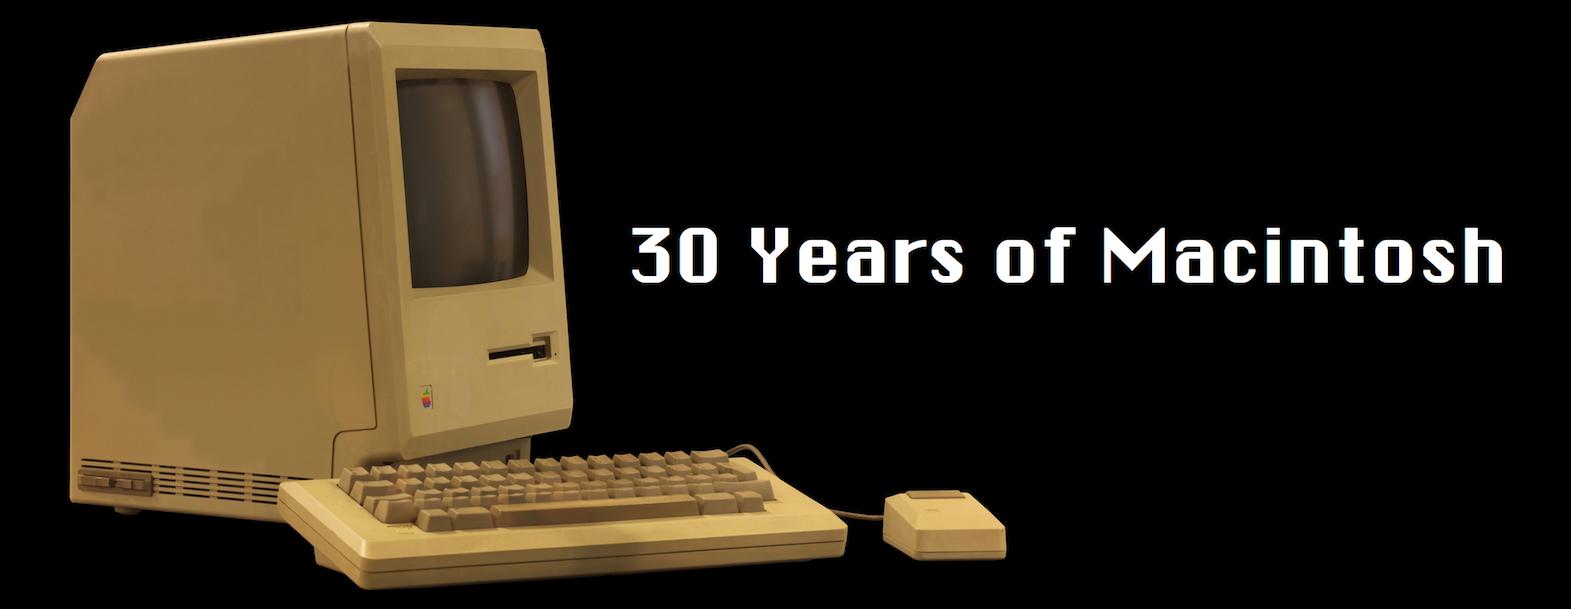 Apple veterans Daniel Kottke and Randy Wigginton on programming the first Mac for the user